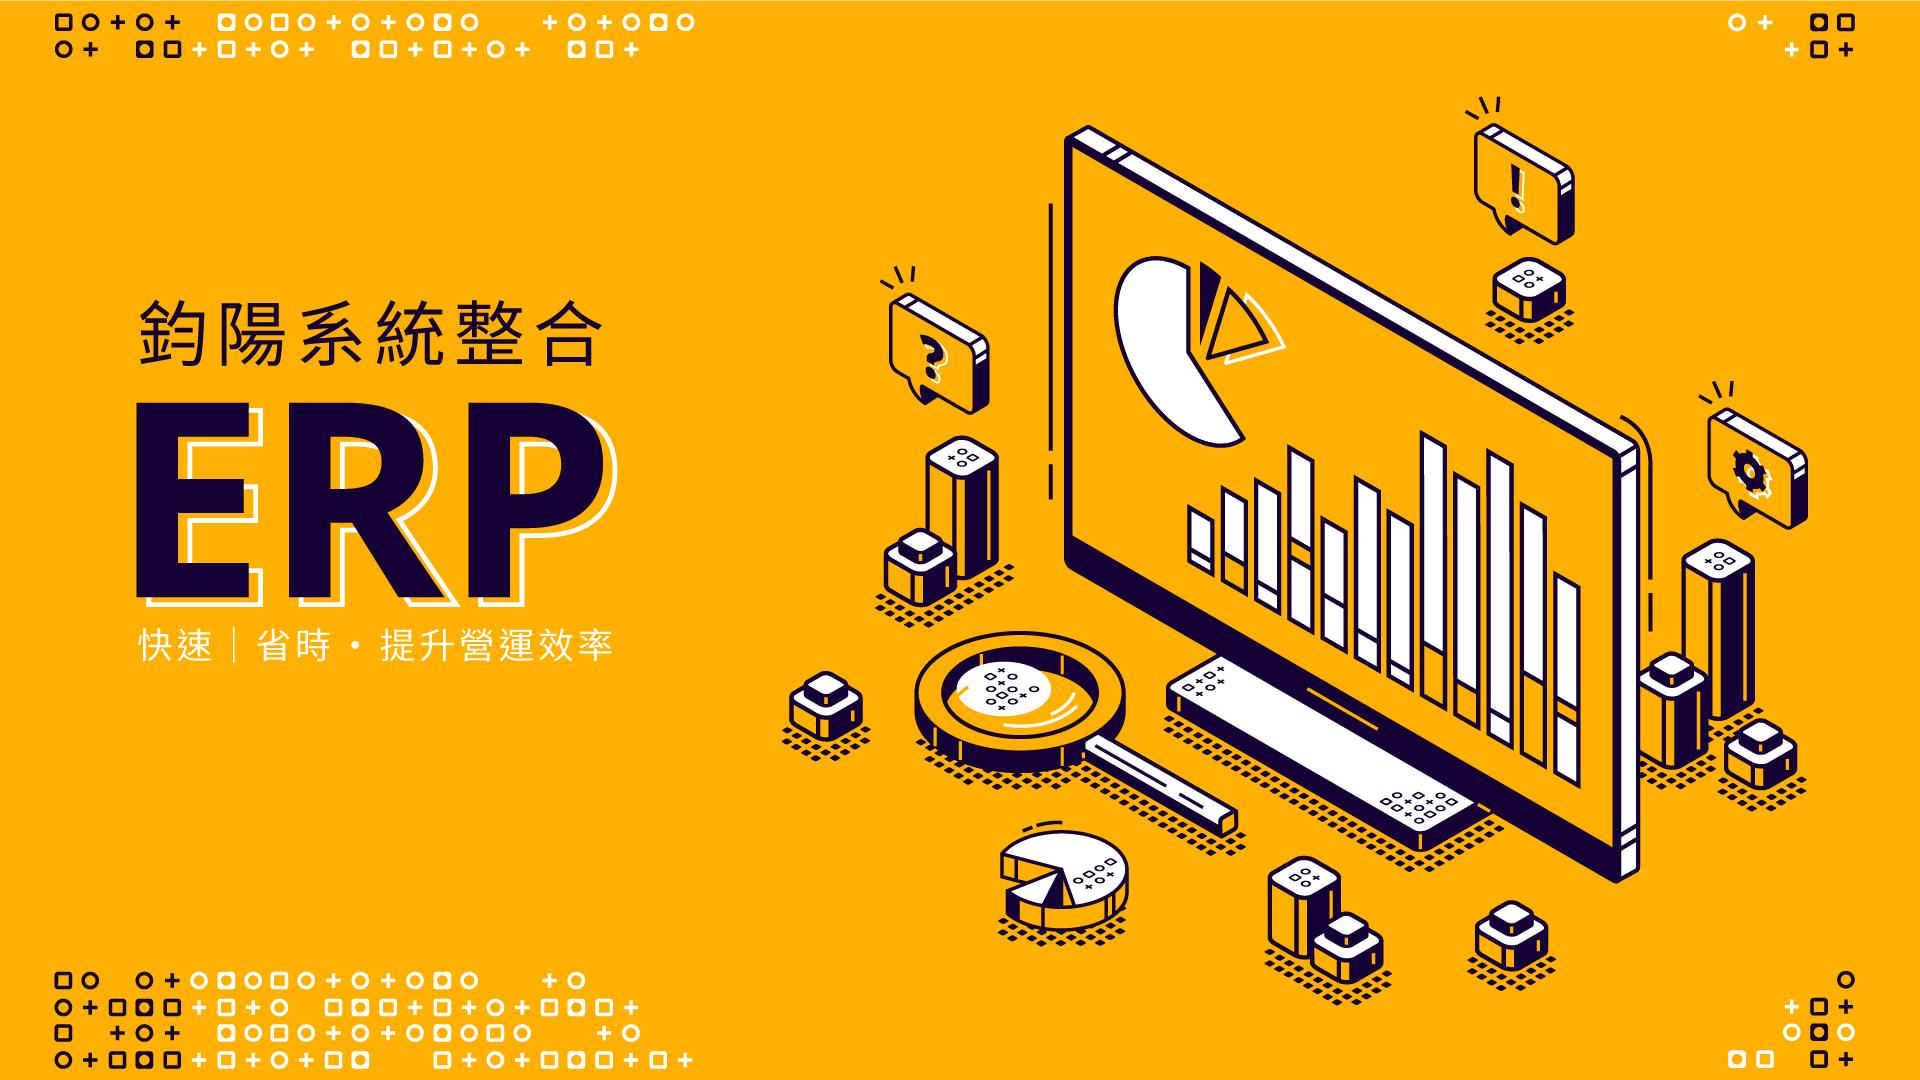 ERP for 購物商城文案 3